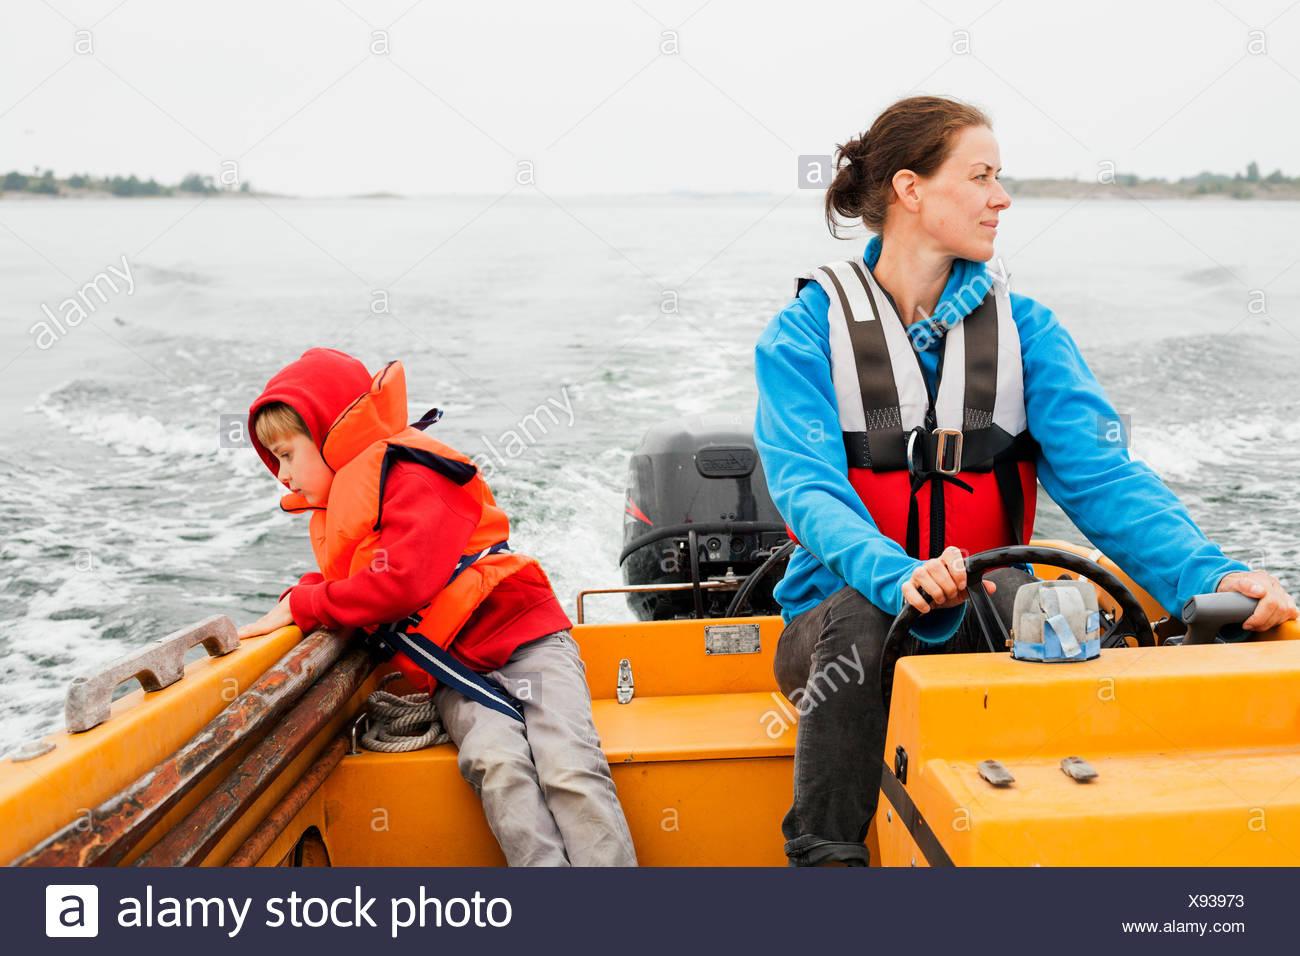 Sweden, Uppland, Runmaro, Barrskar, Mother and son (4-5) on motor boat - Stock Image